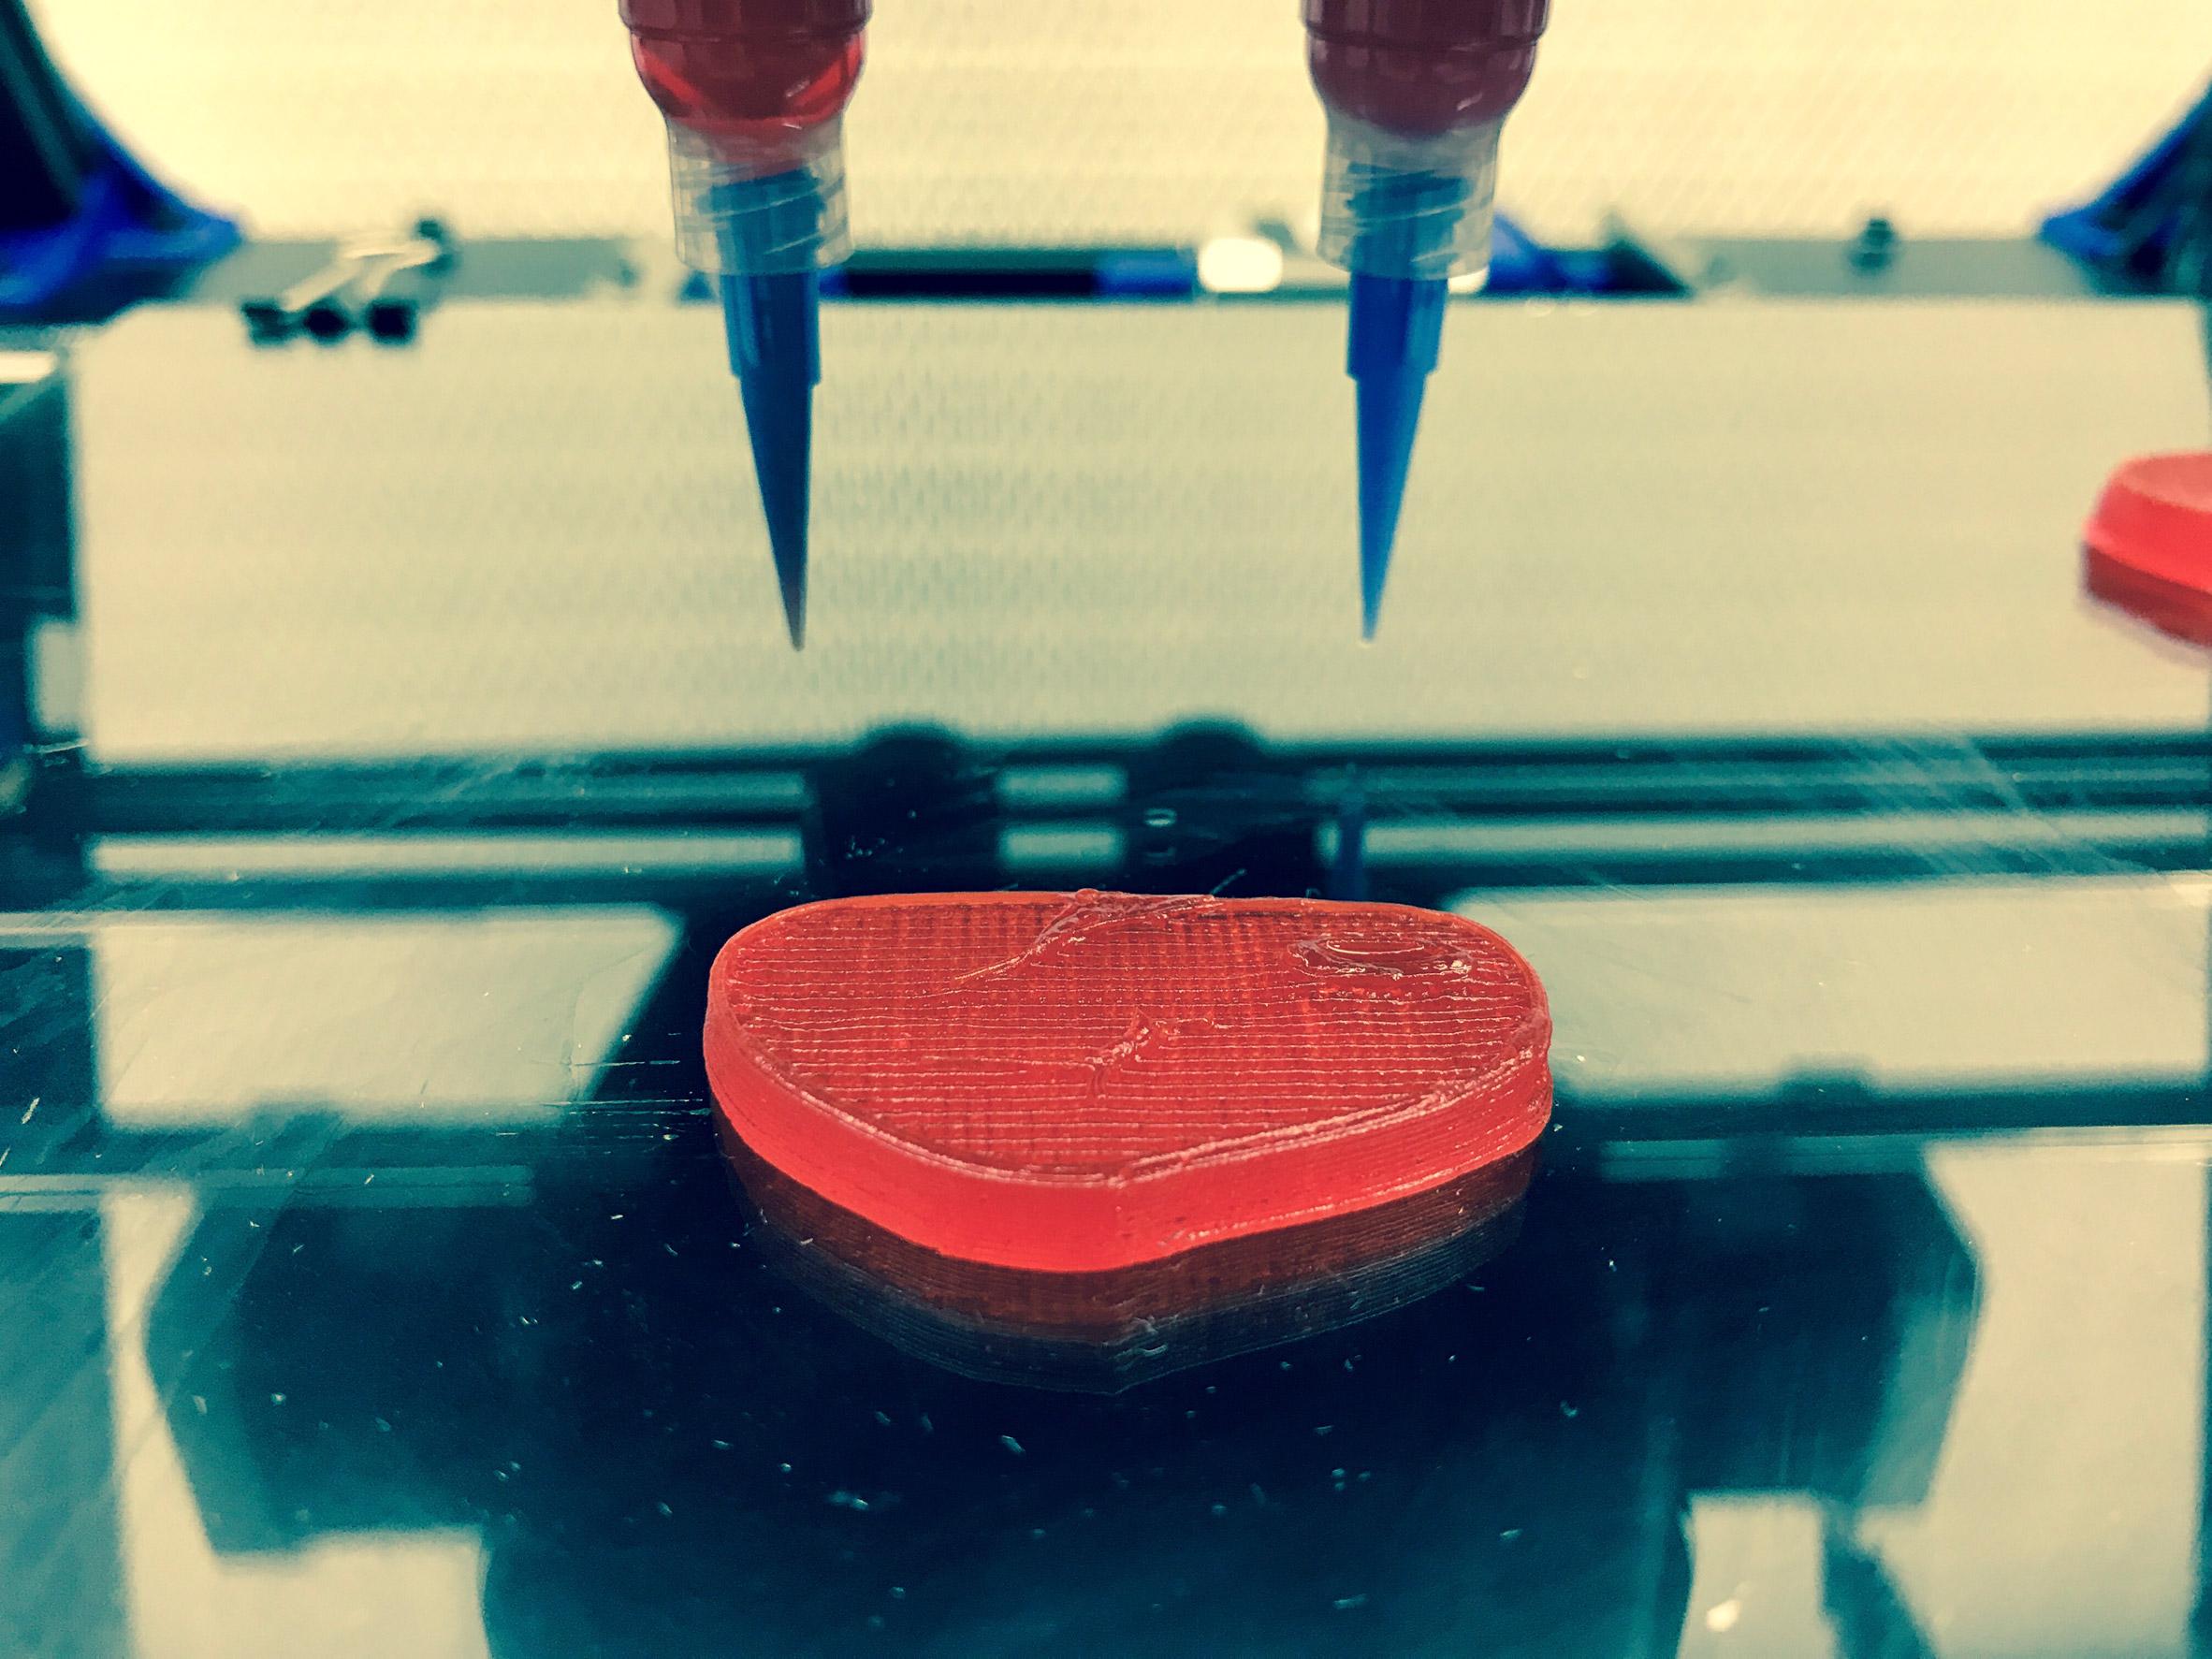 Novameat develops 3D-printed vegan steak from plant-based proteins